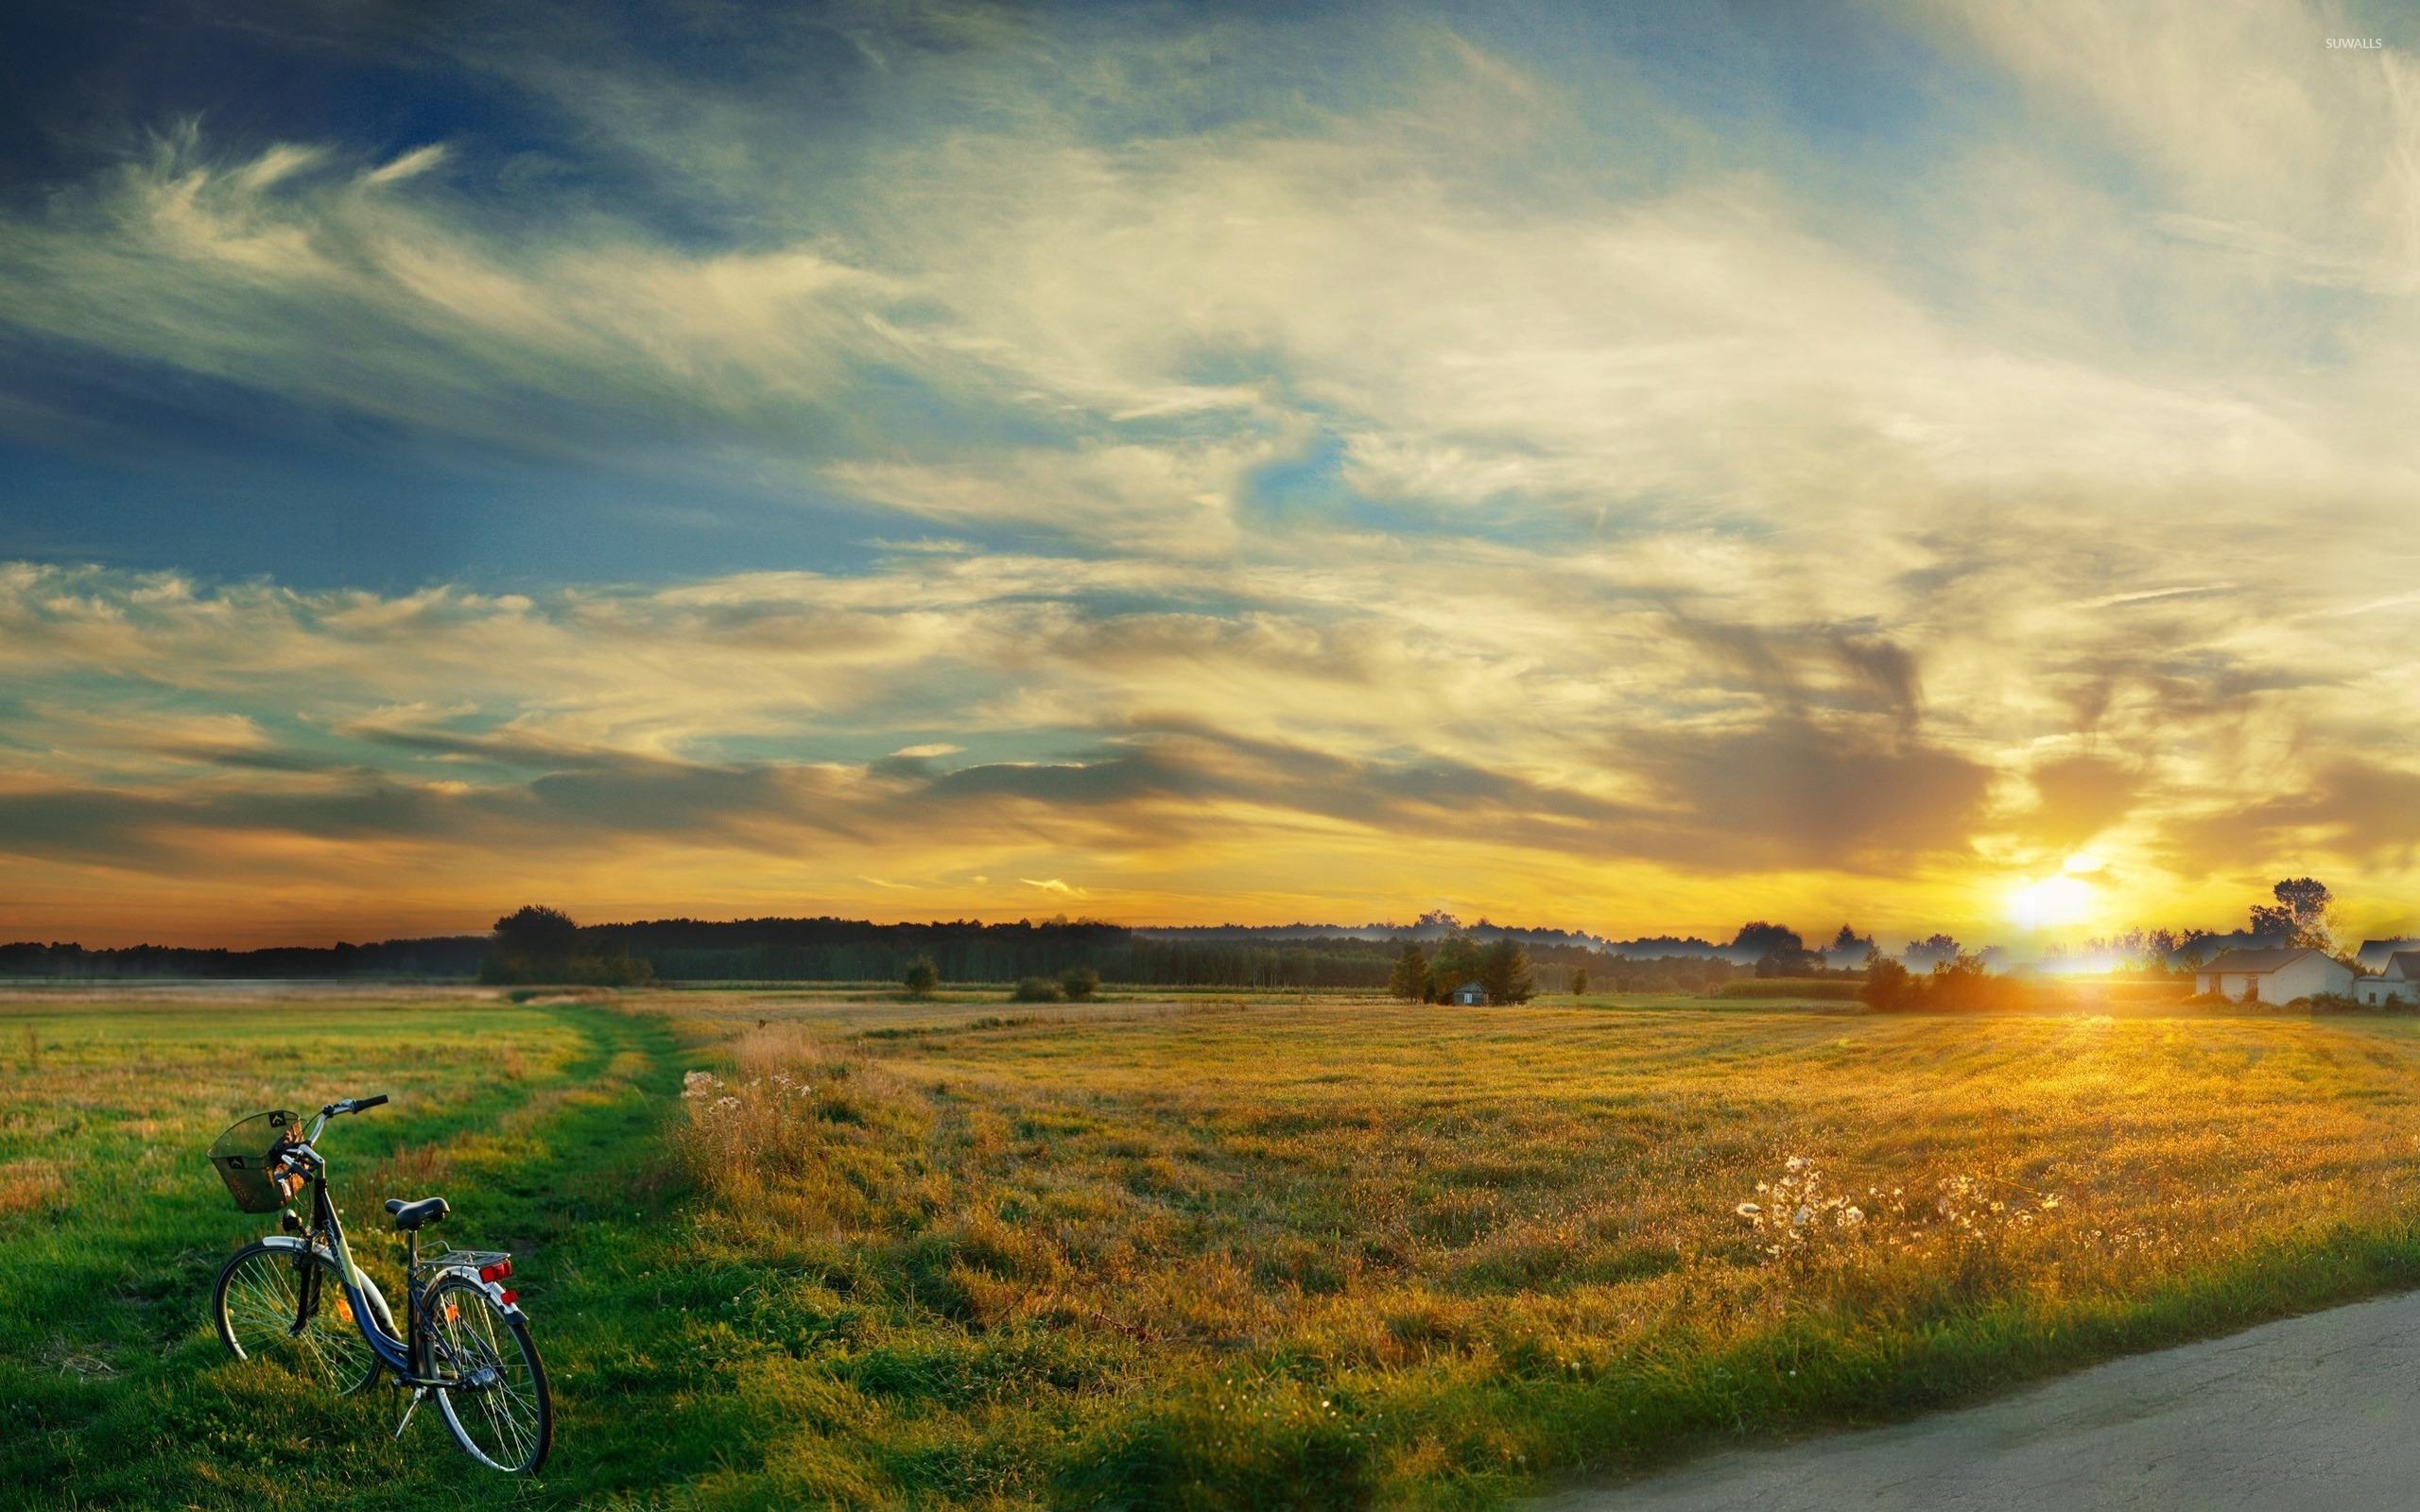 Superb Sunset Lscape Hd Wallpaper